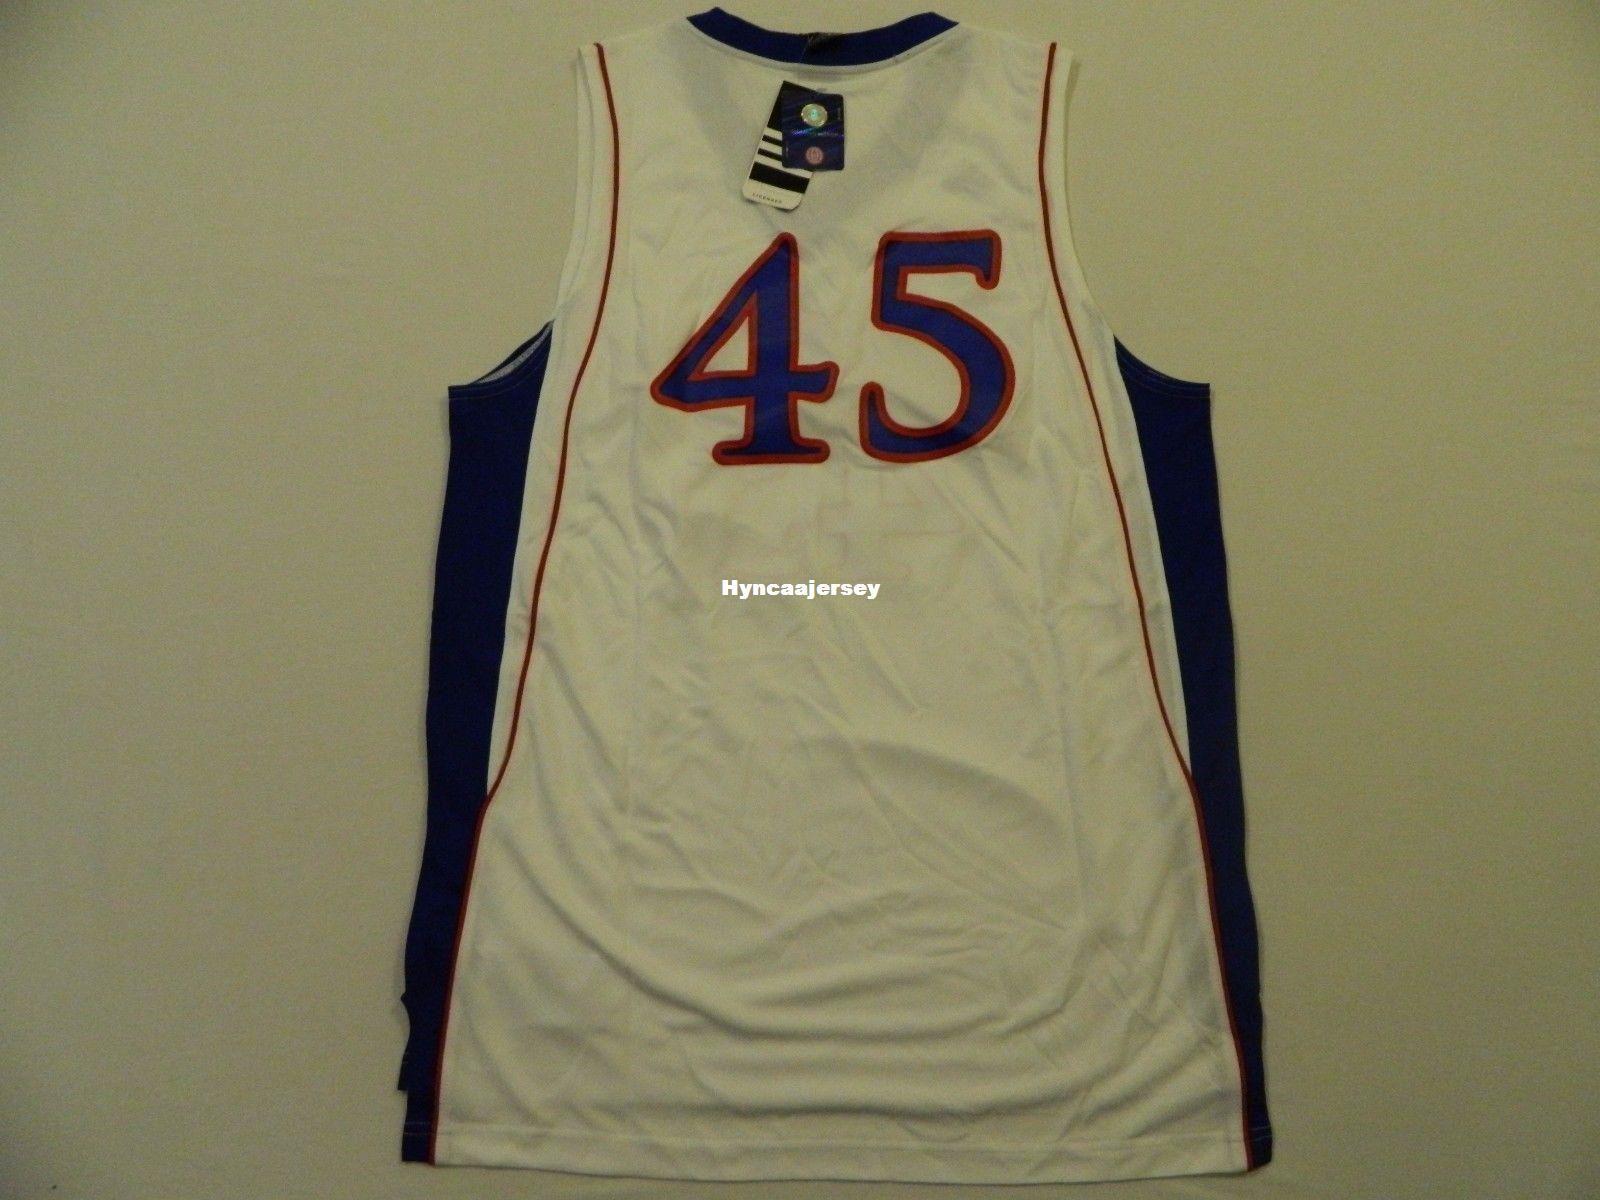 best sneakers f7cad 4d520 Cheap custom Retro New Kansas Jayhawks 45 White AD Basketball Jersey MEN S  Stitched Vintage sleeveless vest jerseys Ncaa